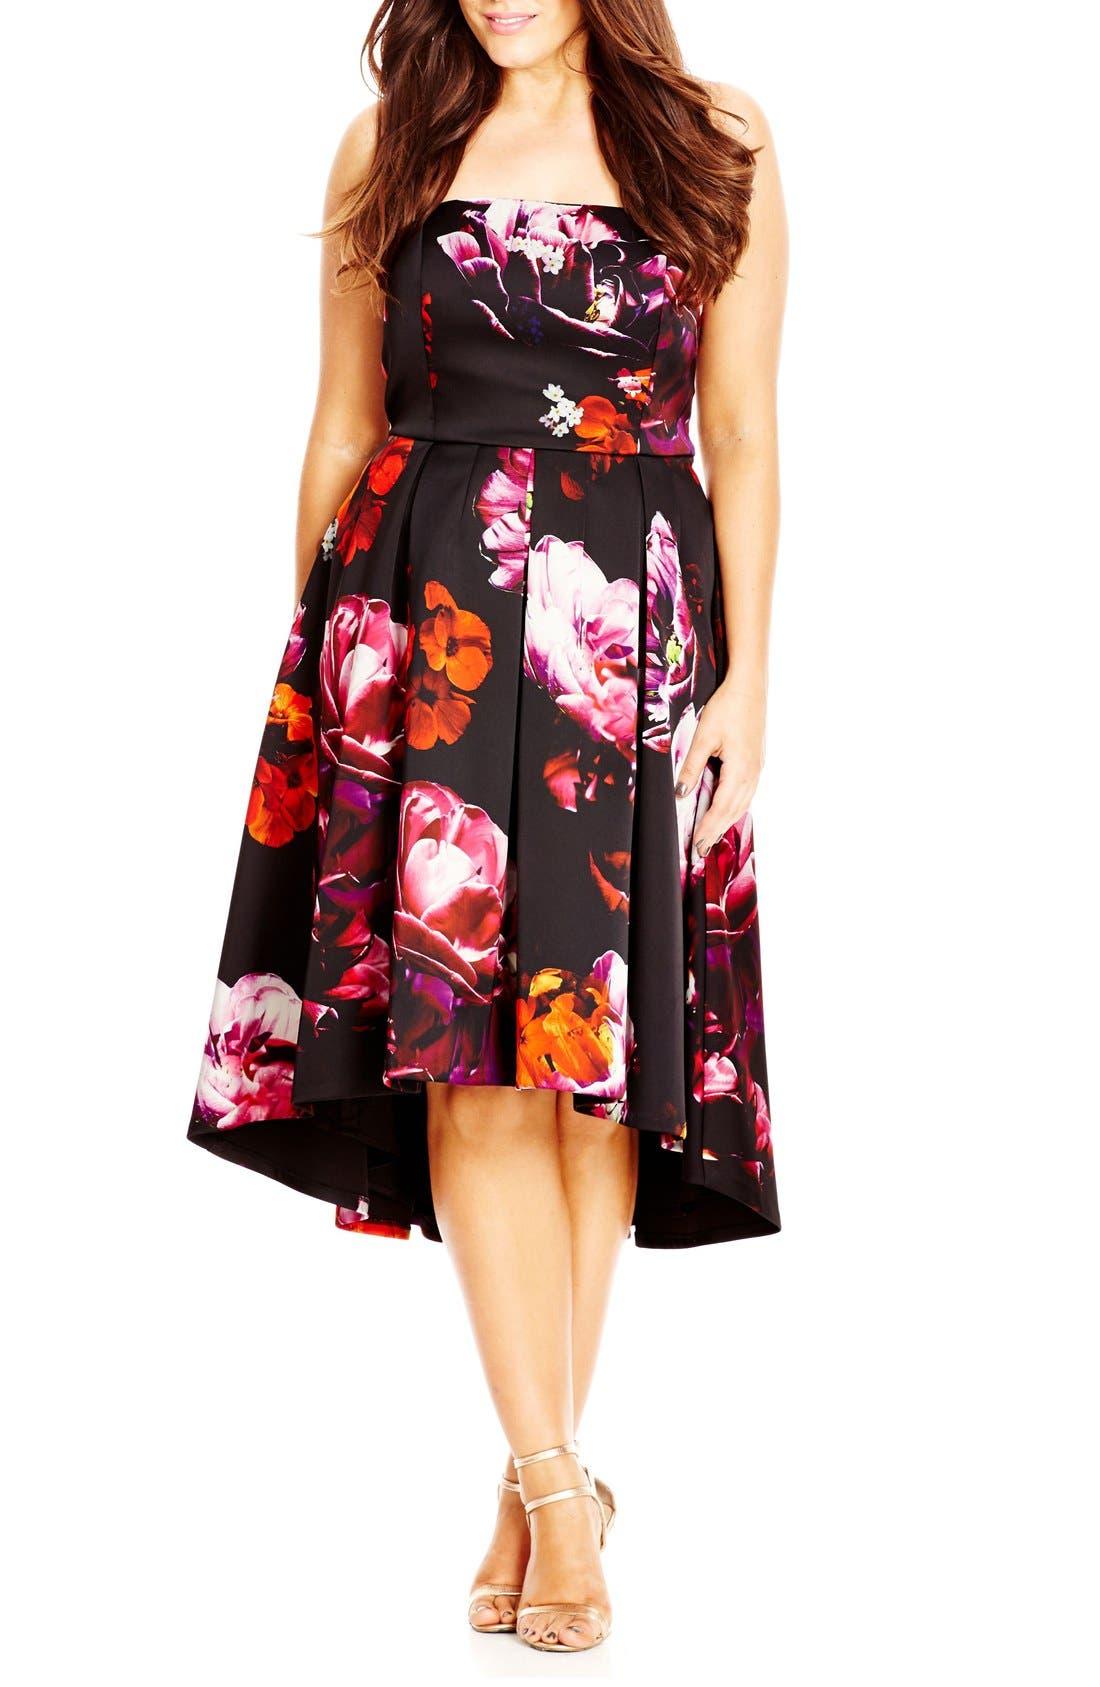 City Chic 'Floral Magic' Floral Print Strapless High/Low Dress (Plus Size)